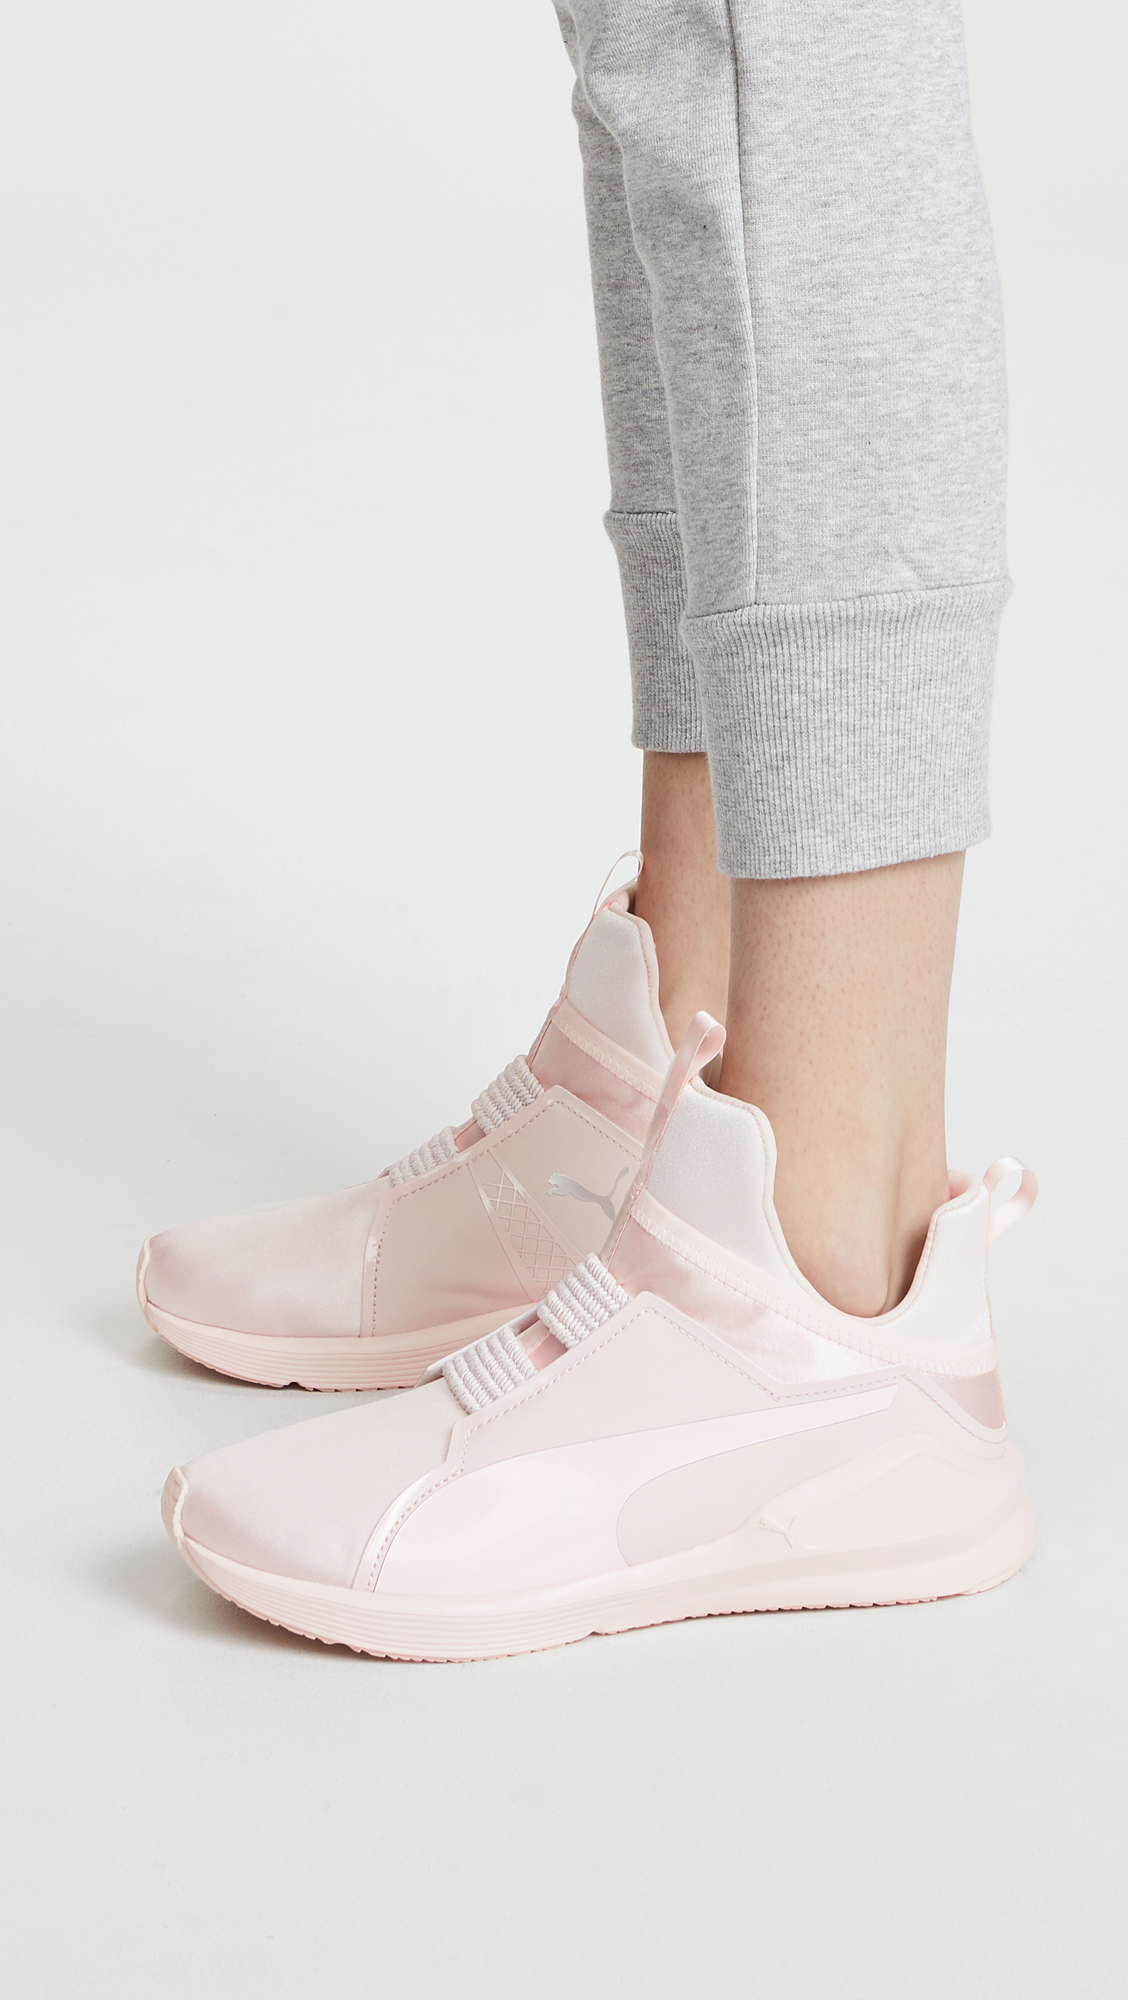 PUMA Fierce Satin EP Sneakers  1796b0d63